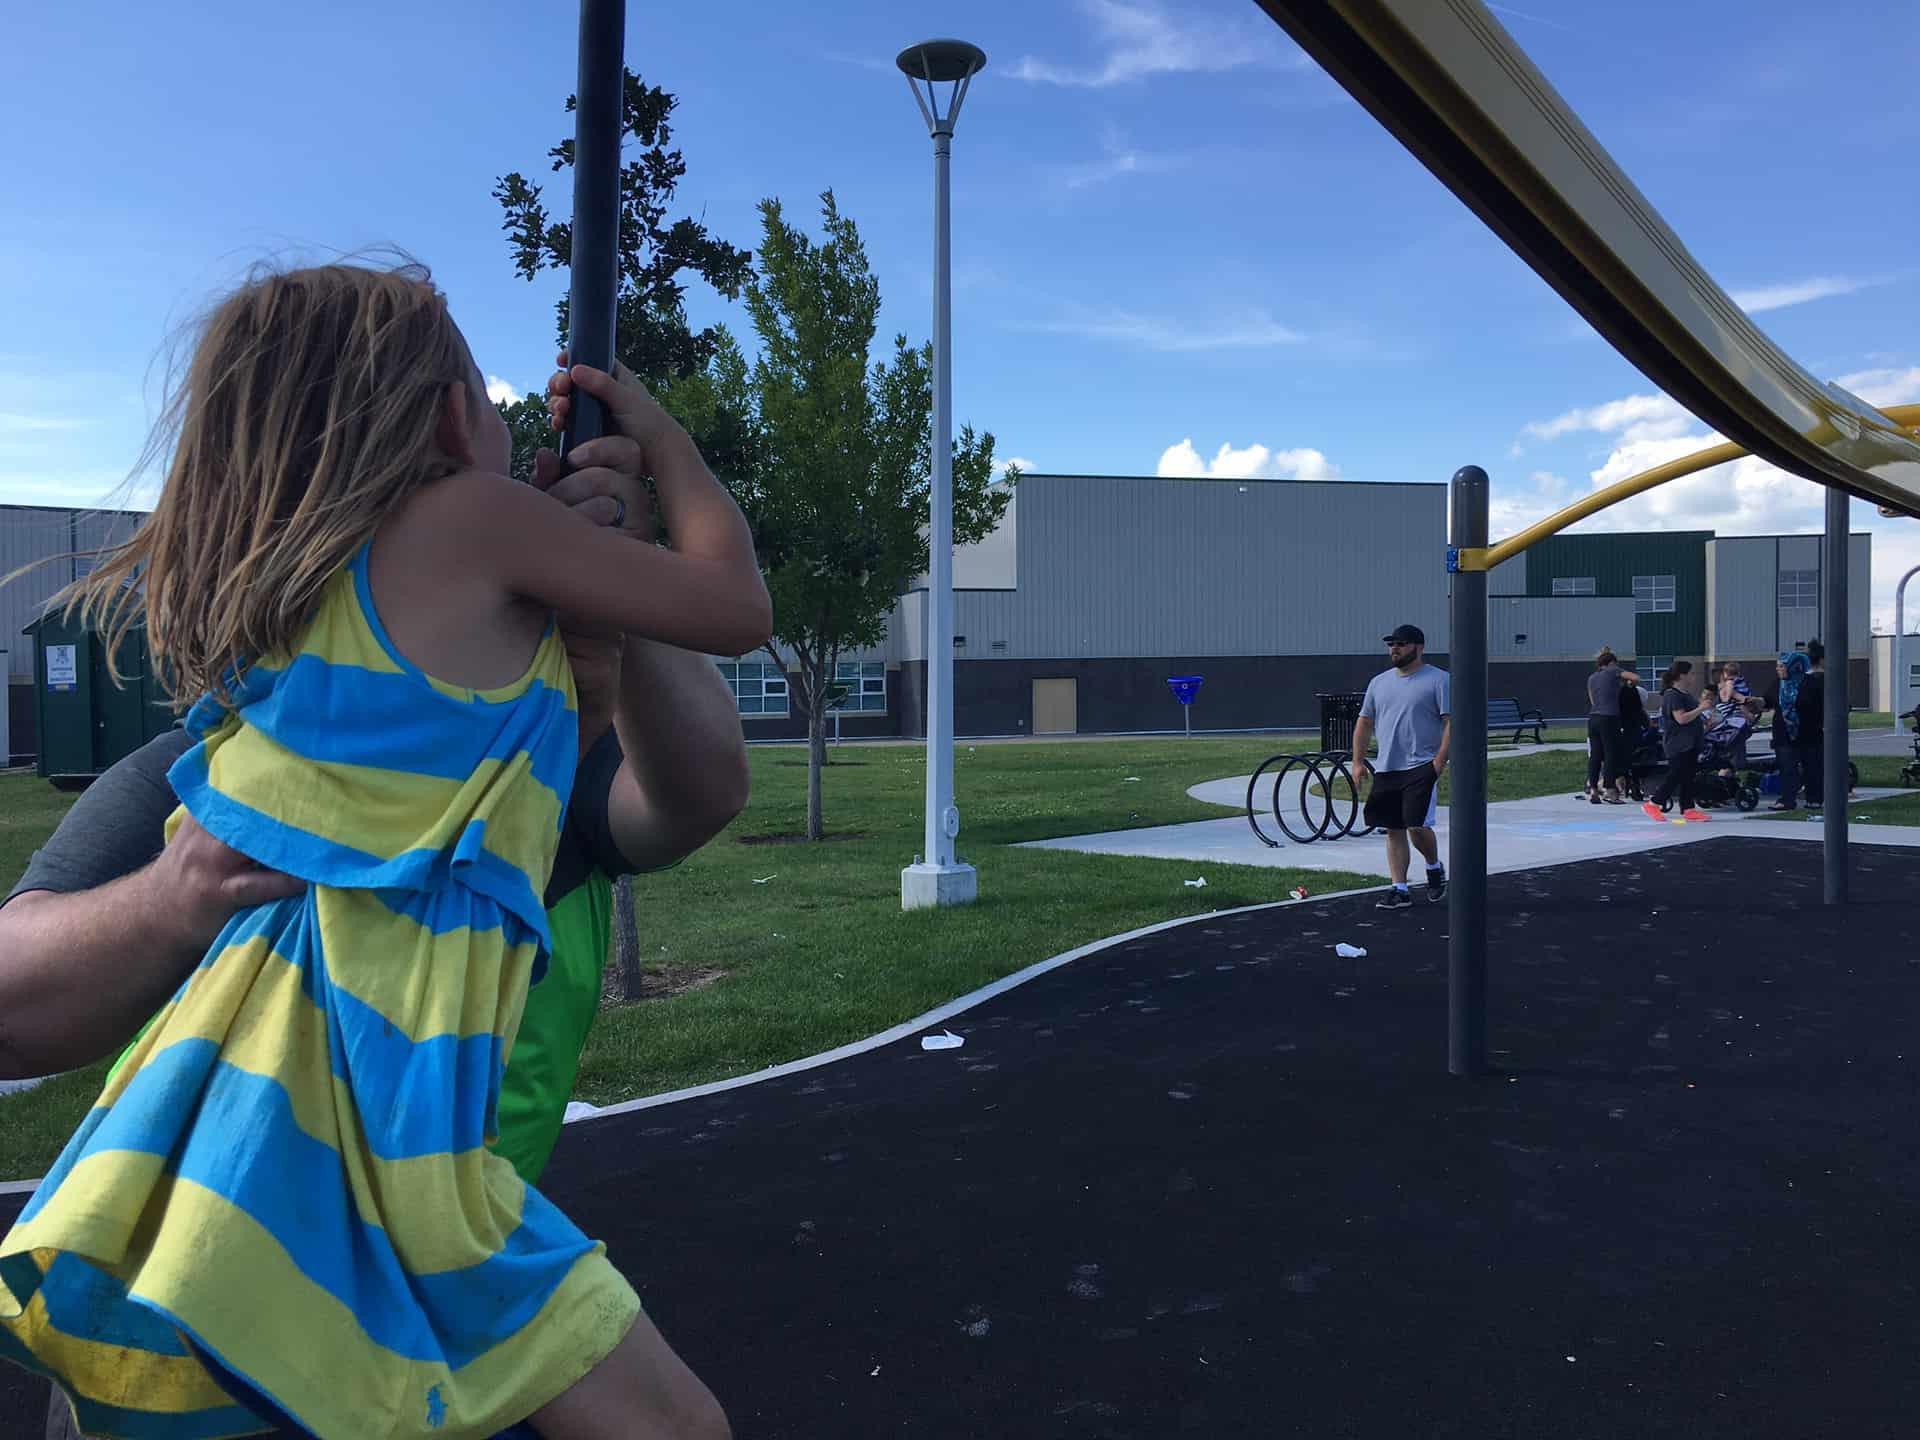 Zipline at Florence Hallock School